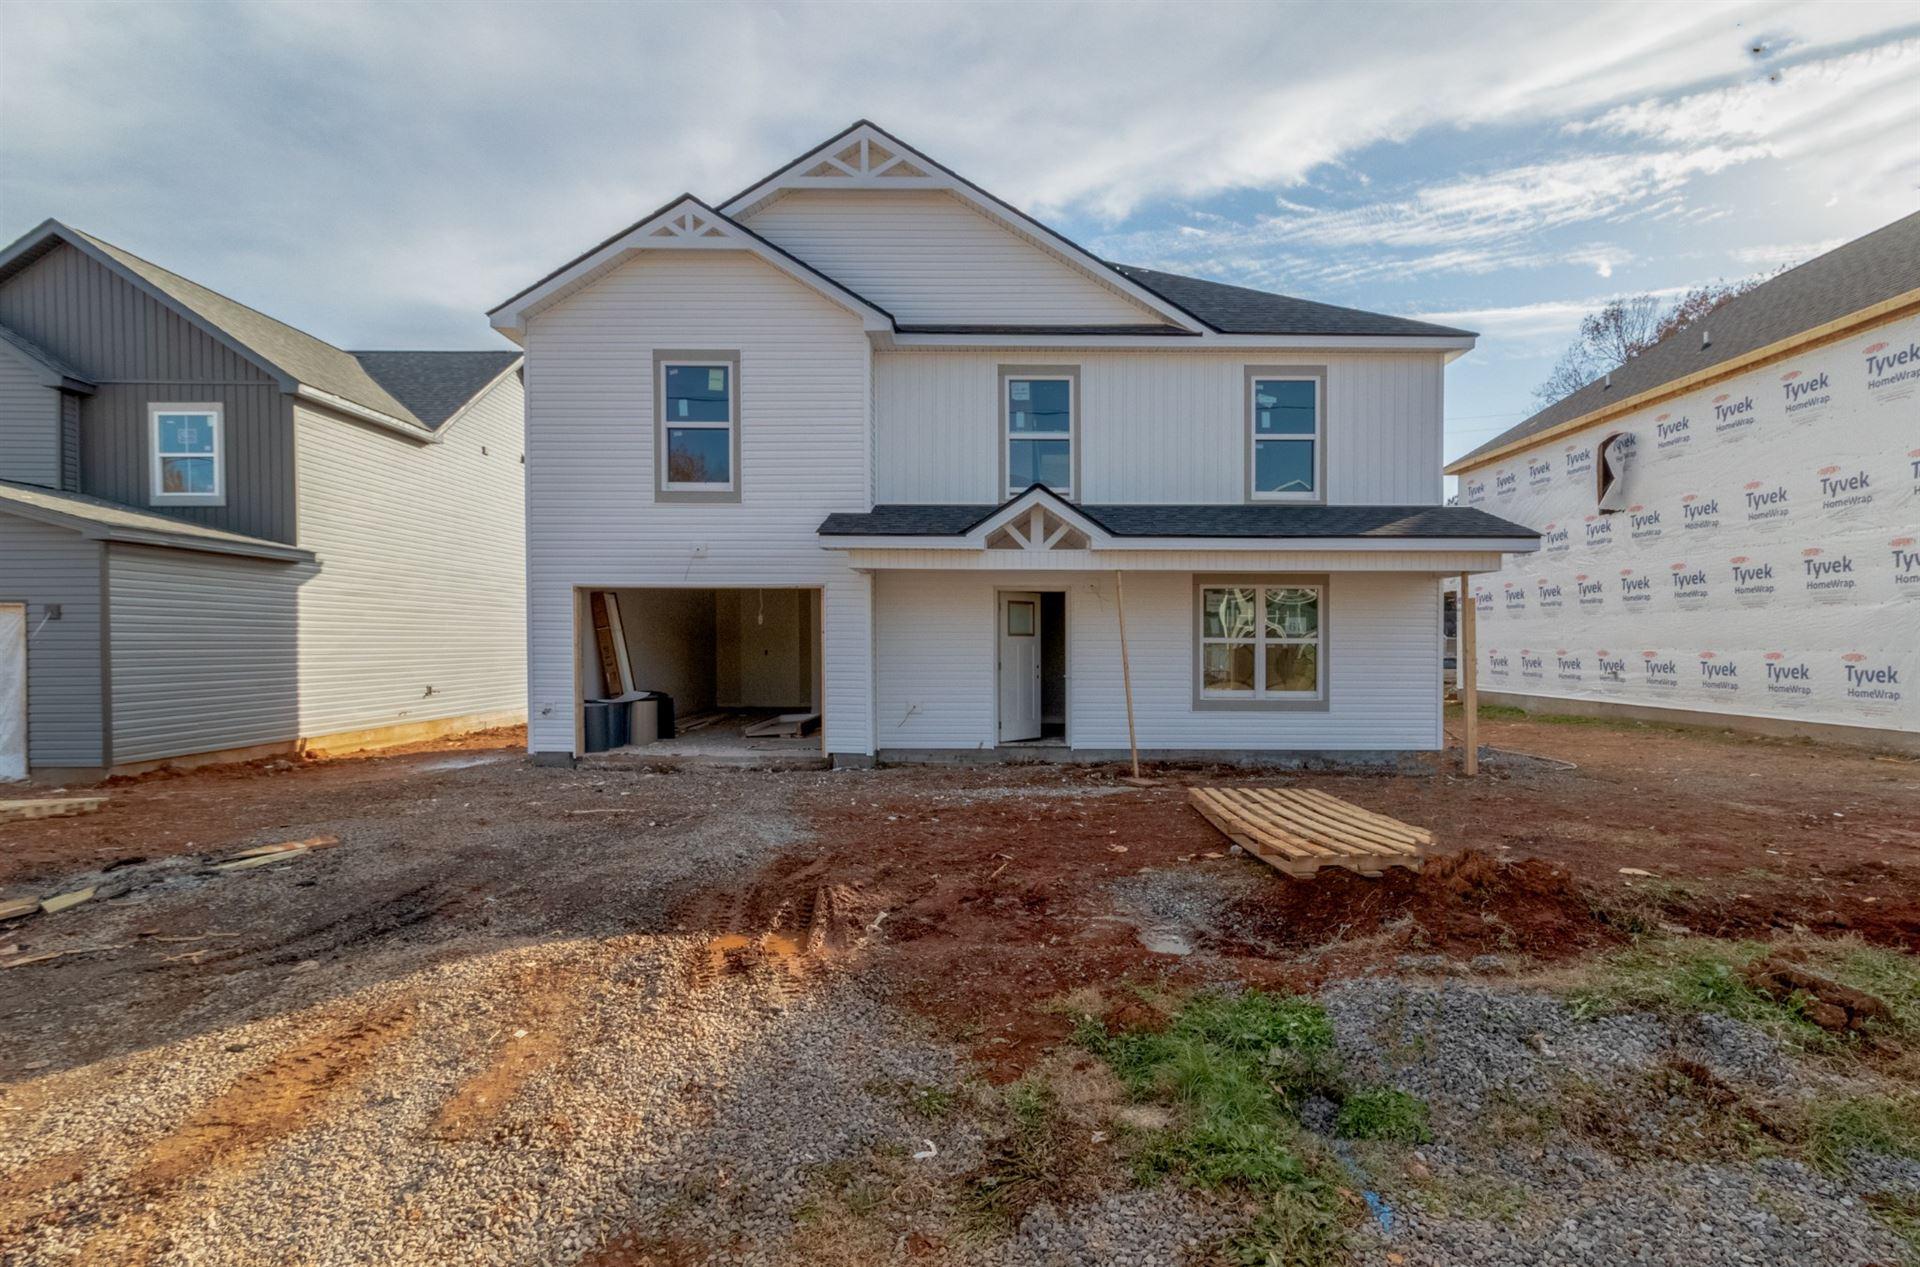 61 Campbell Heights, Clarksville, TN 37042 - MLS#: 2295043